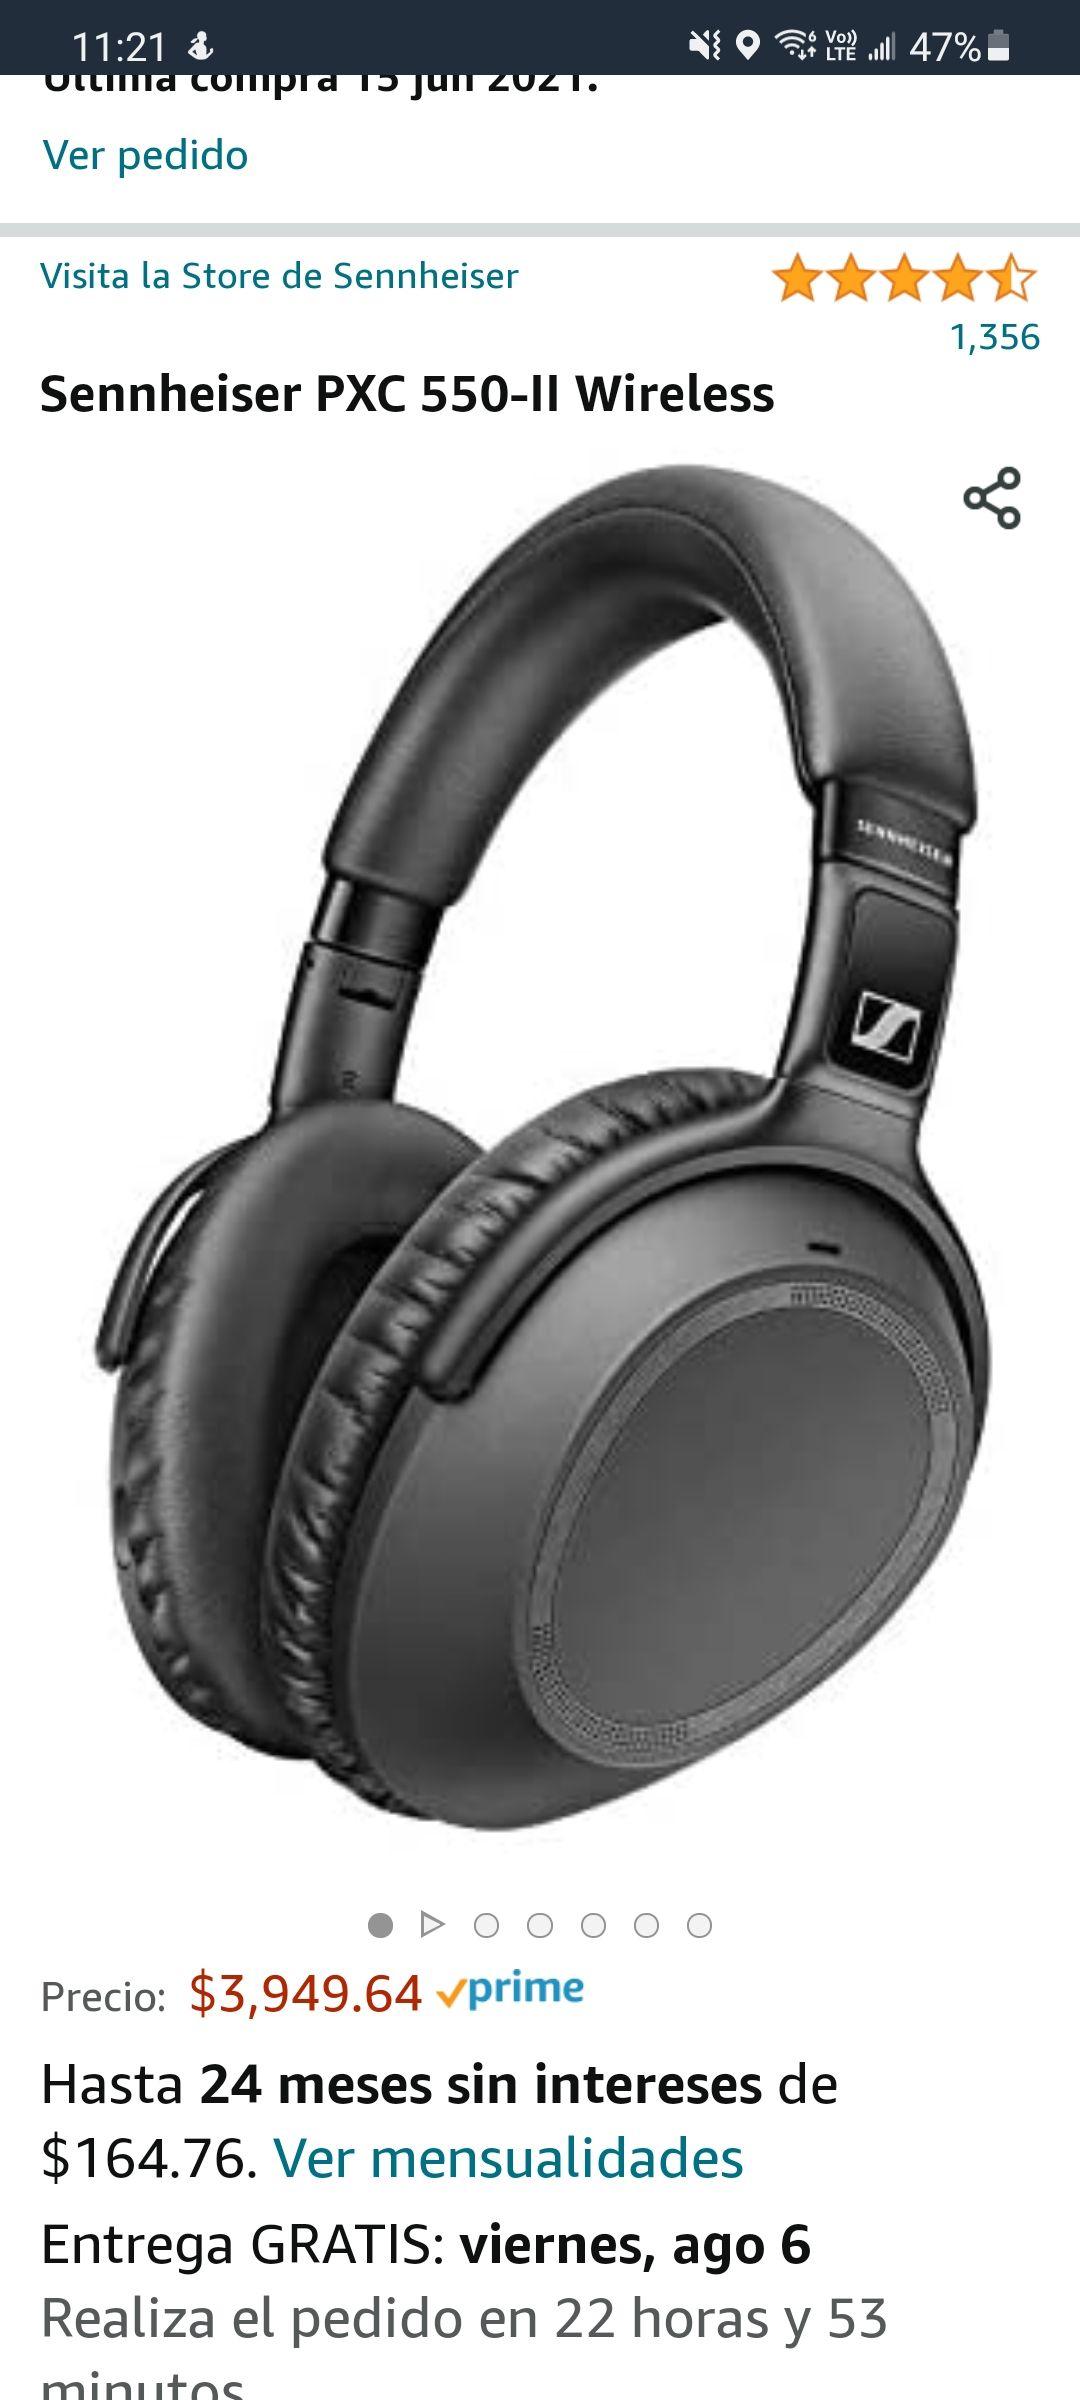 Amazon: Sennheiser PXC 550-II Wireless